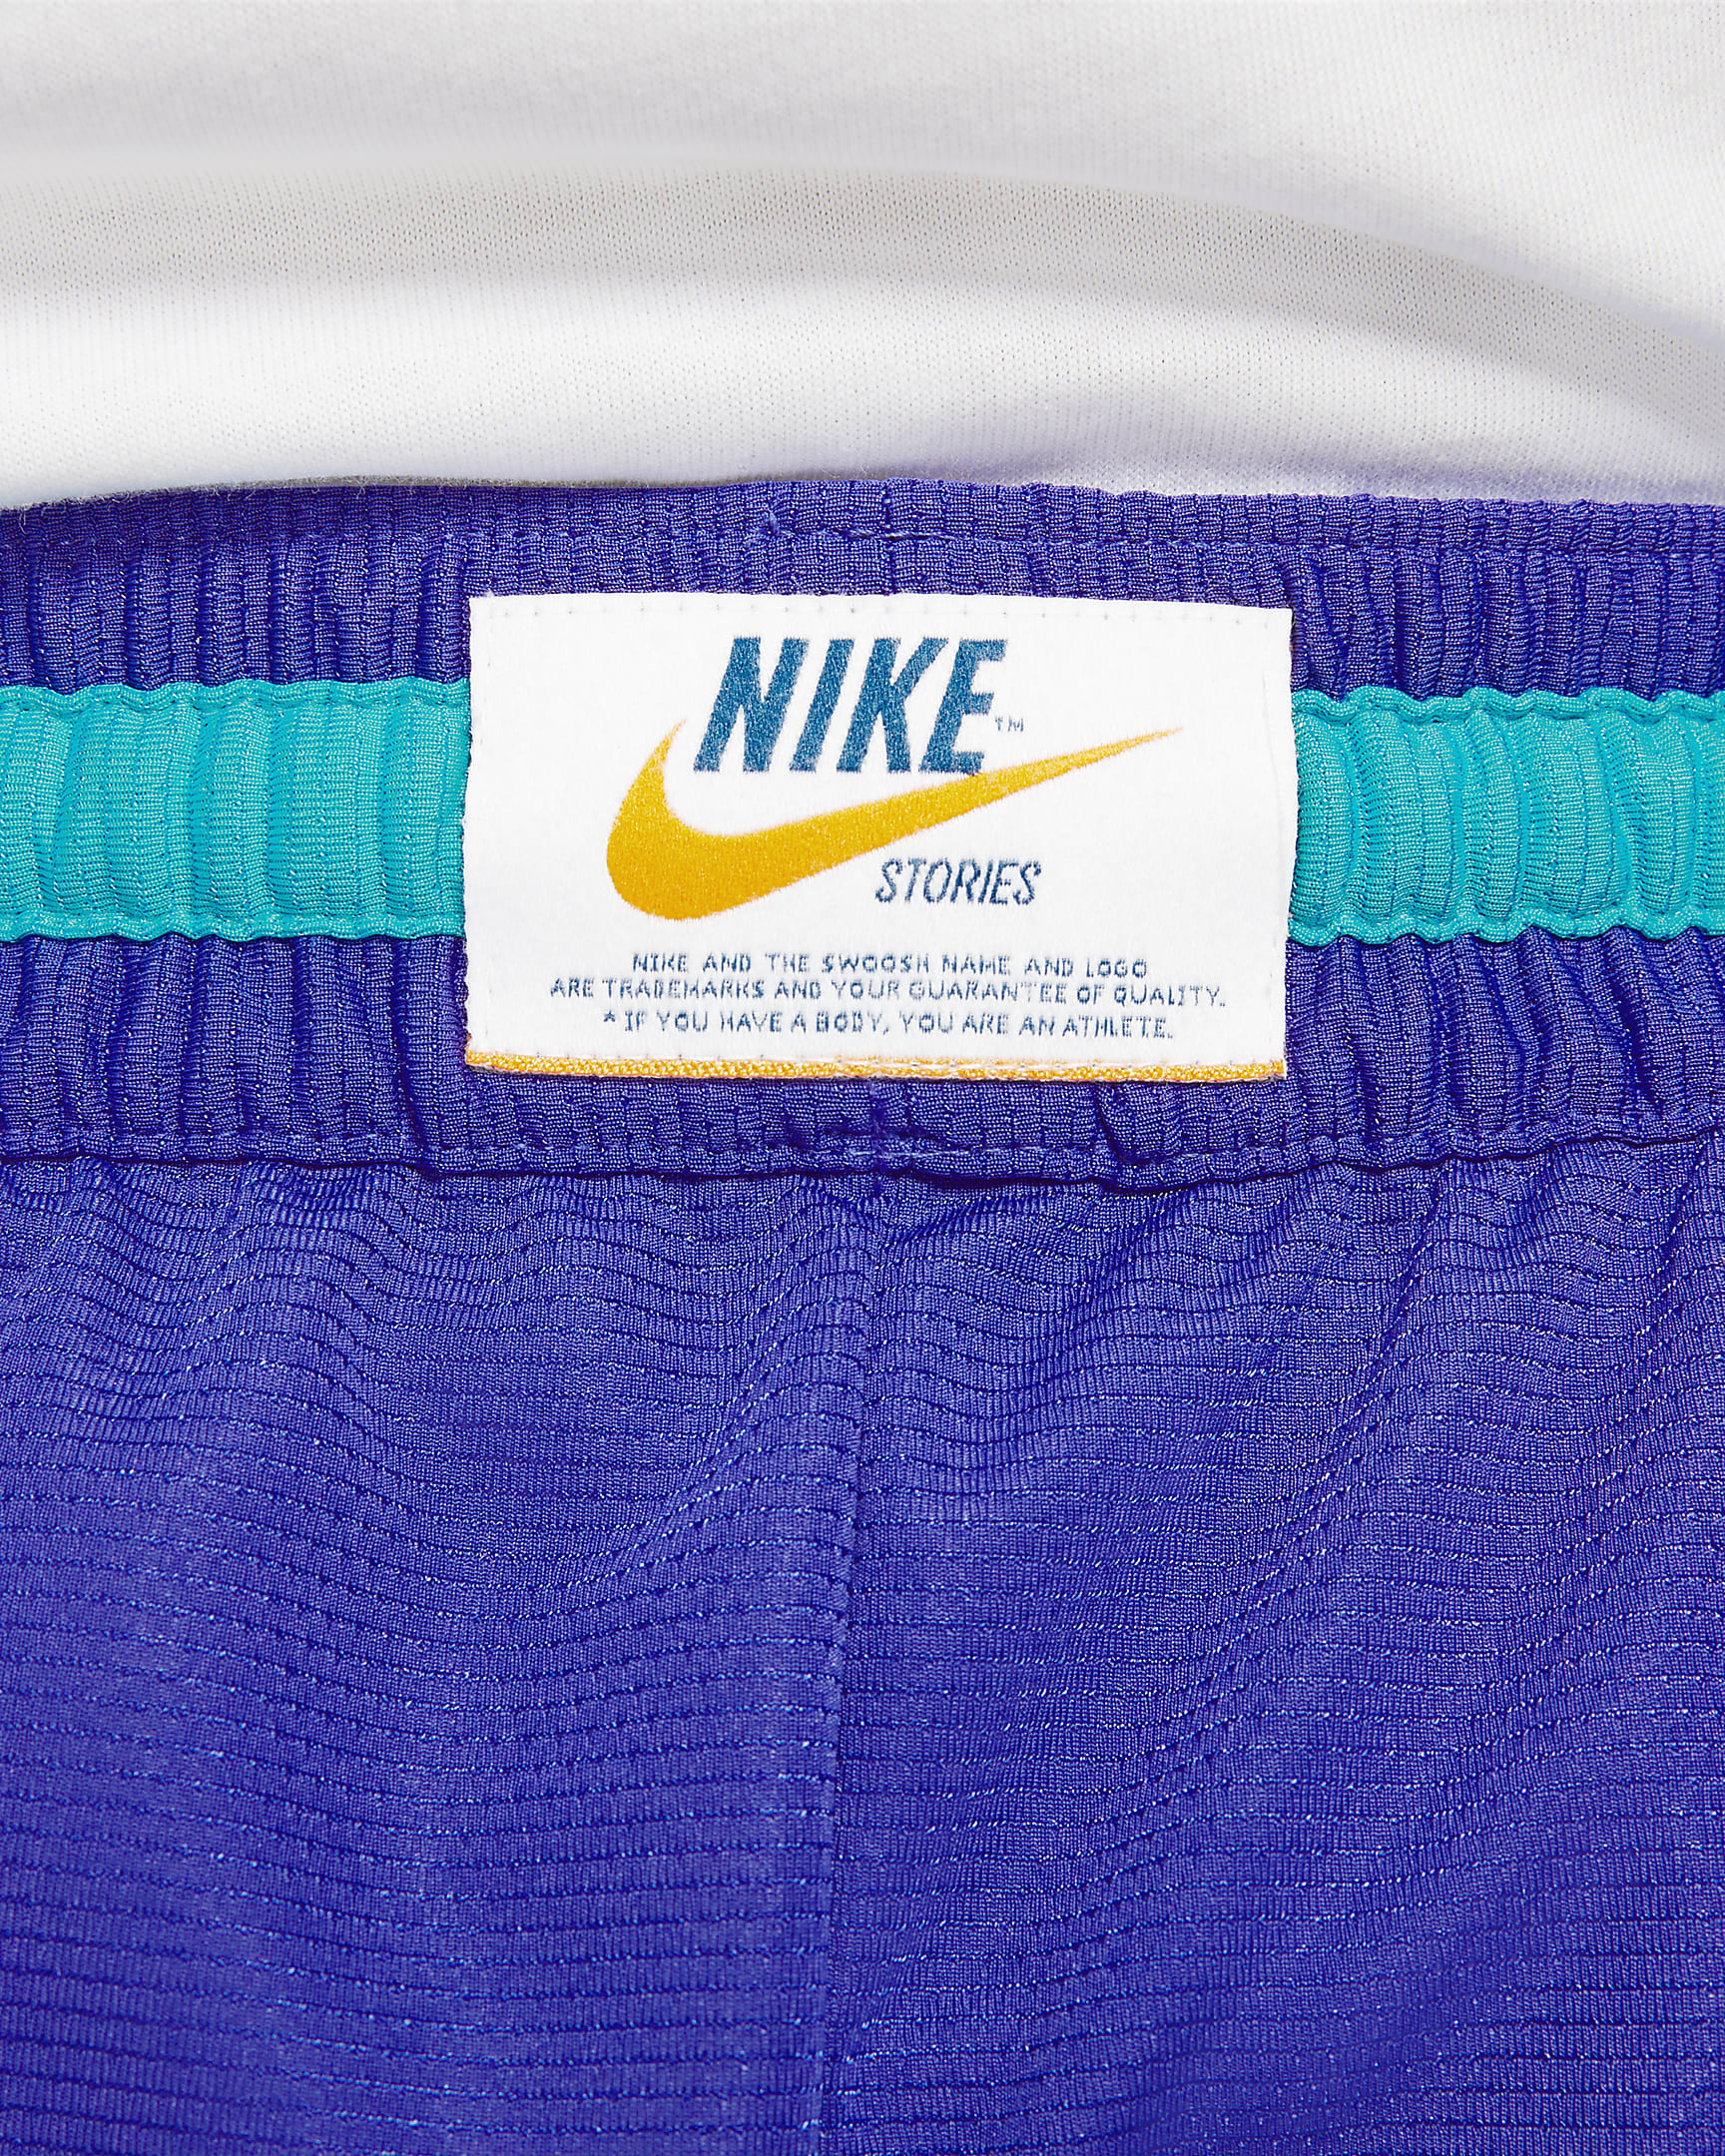 nike-dri-fit-dna-stories-mens-basketball-shorts-gLqWHW-5.png